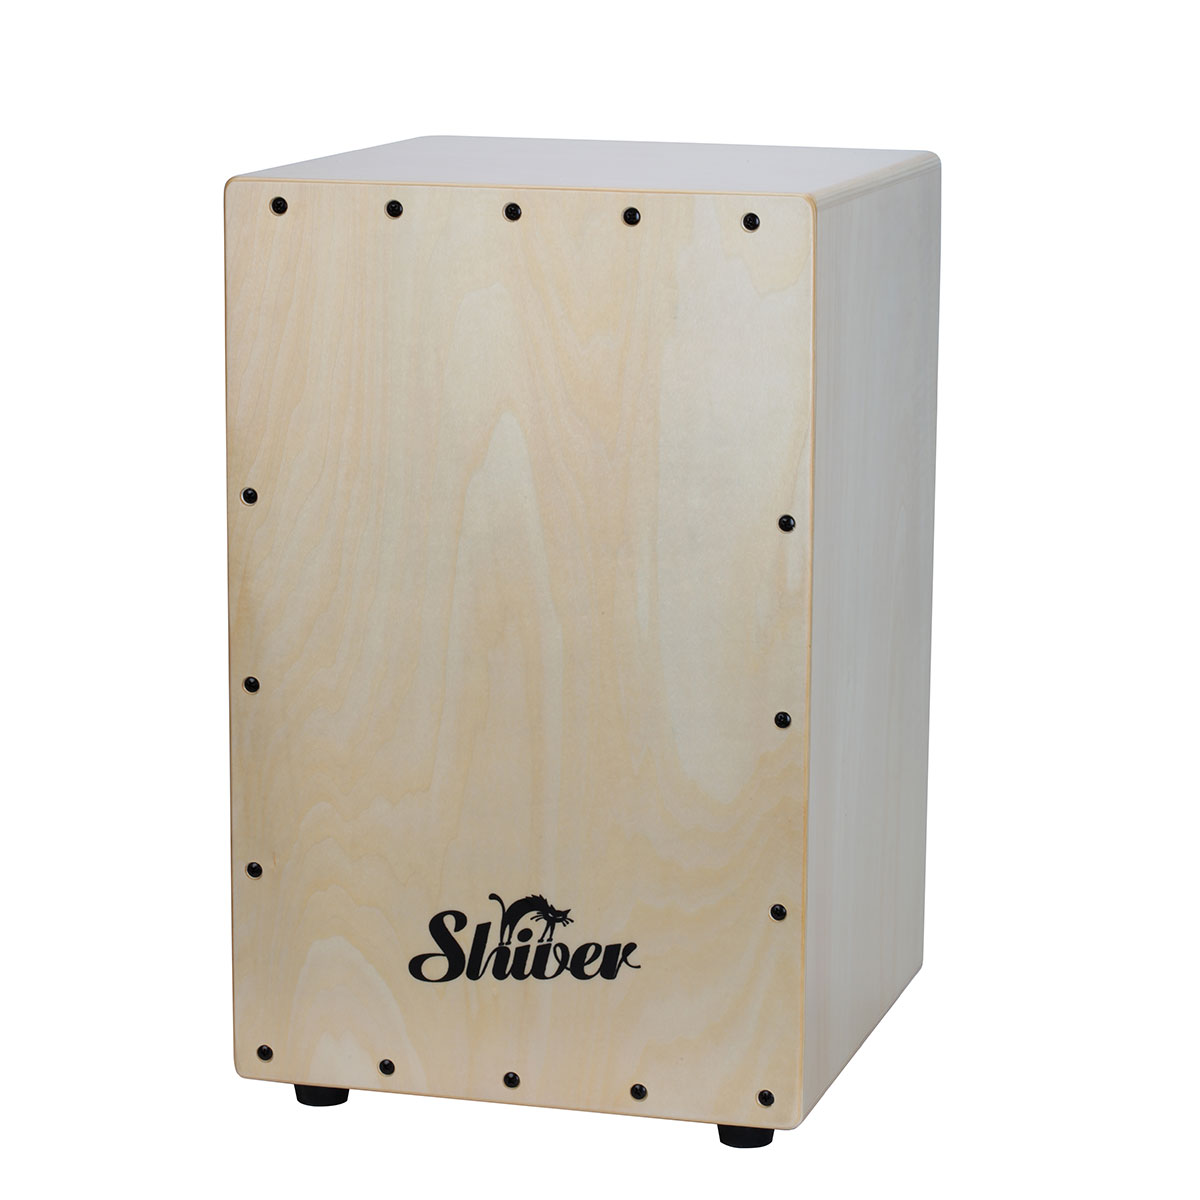 Shiver - CJS 10 Cajon tilleul